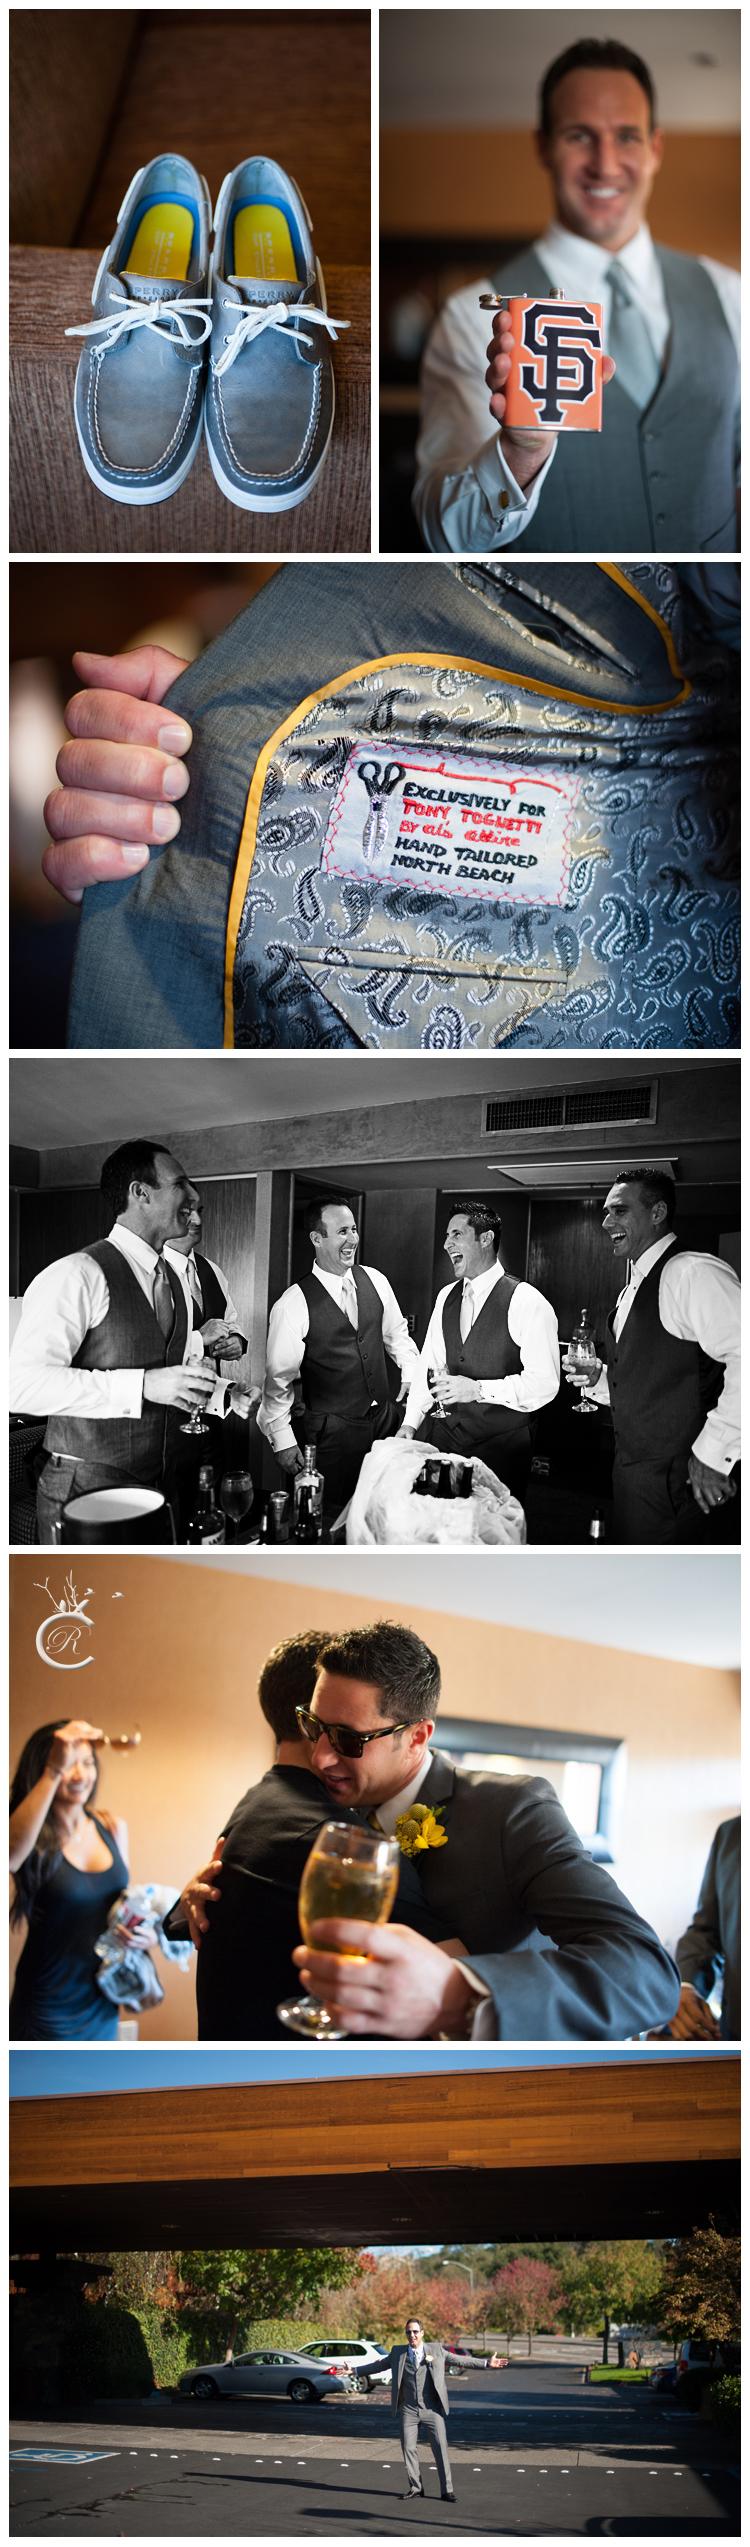 Fun SF Giants flask for the groom!